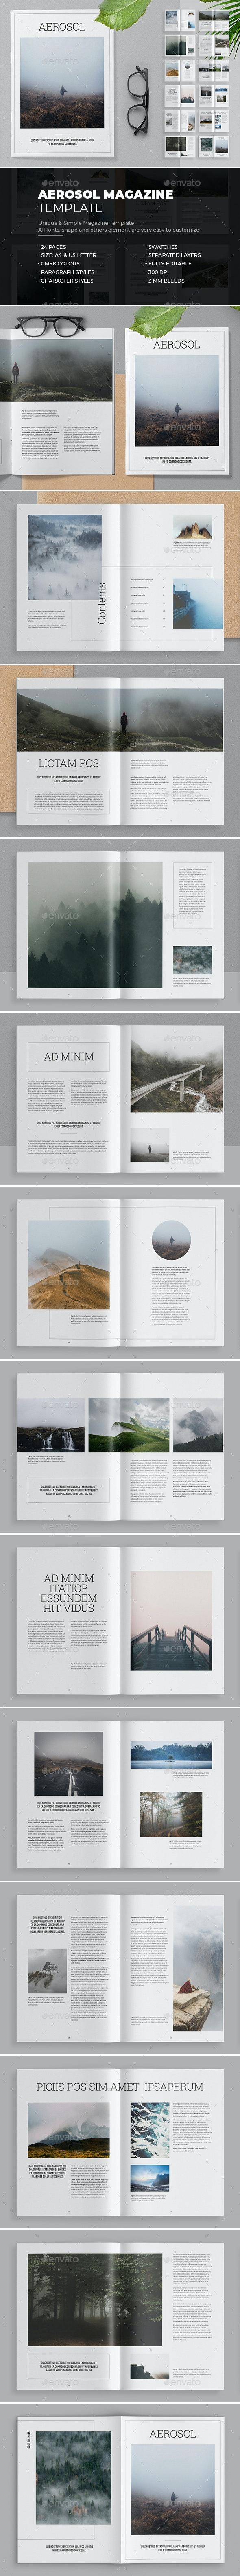 Aerosol Magazine Template - Magazines Print Templates